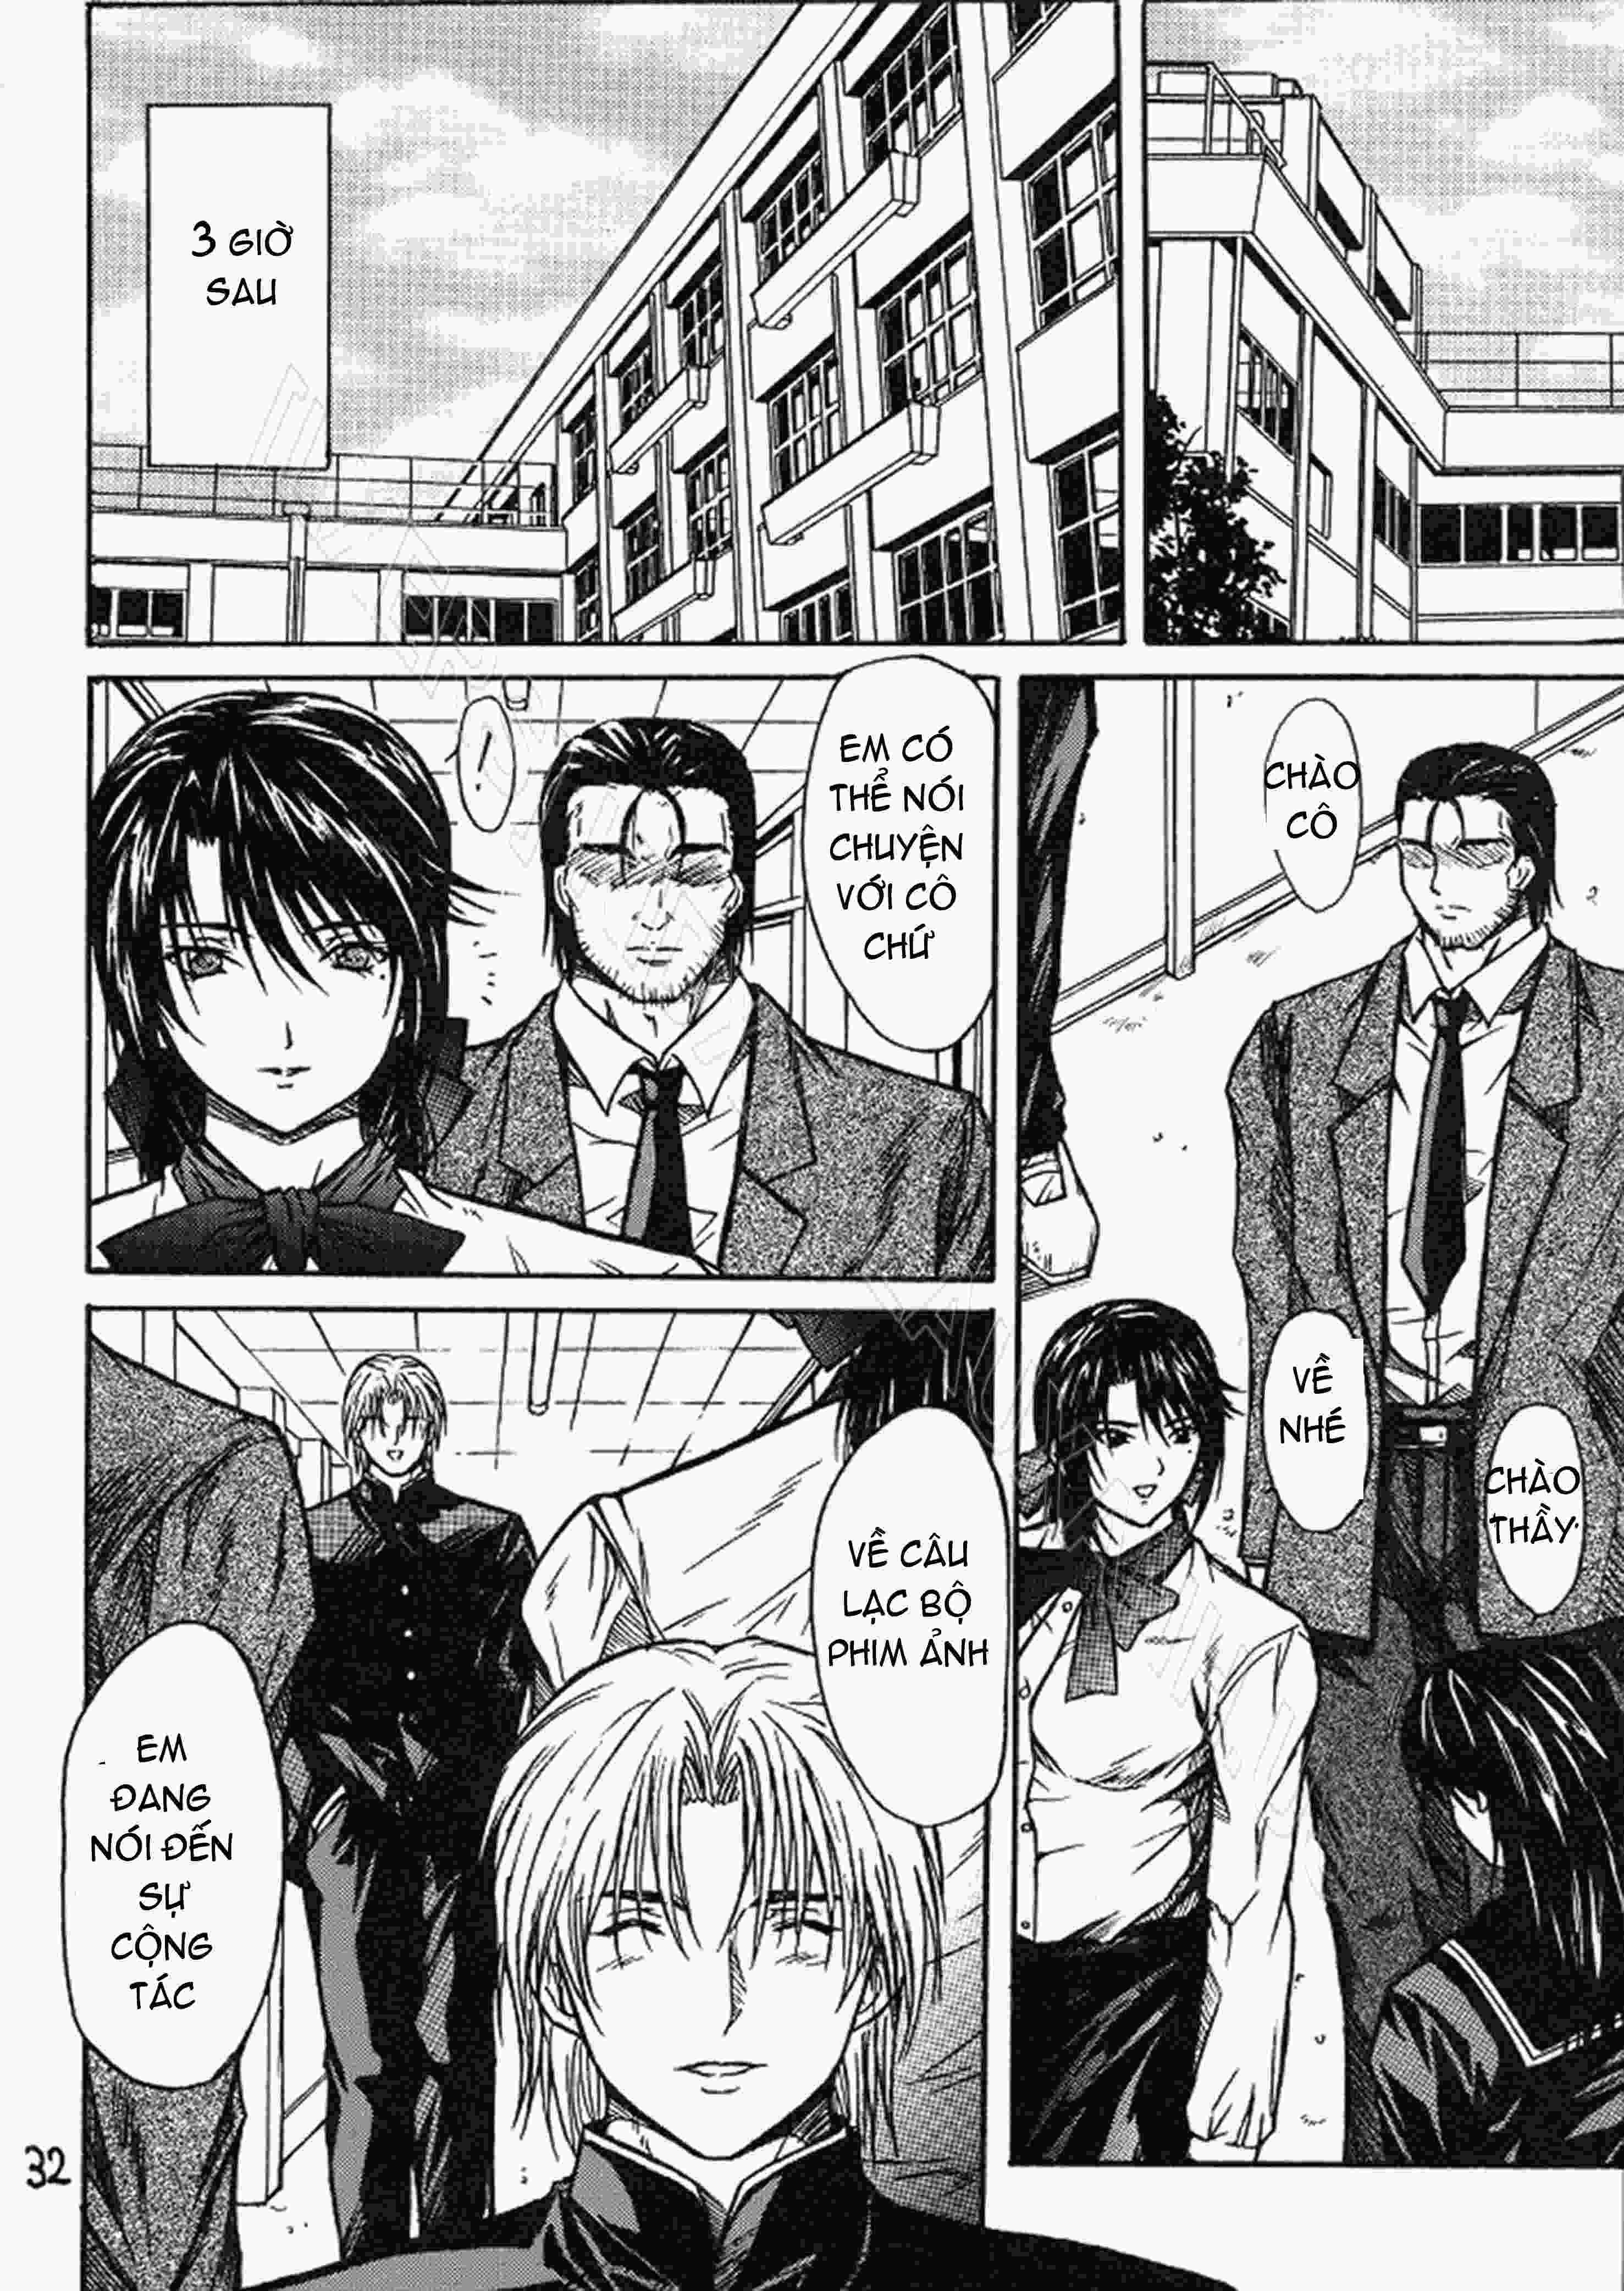 TruyenHay.Com - Ảnh 31 - Ryoujoku Rensa Chapter 1